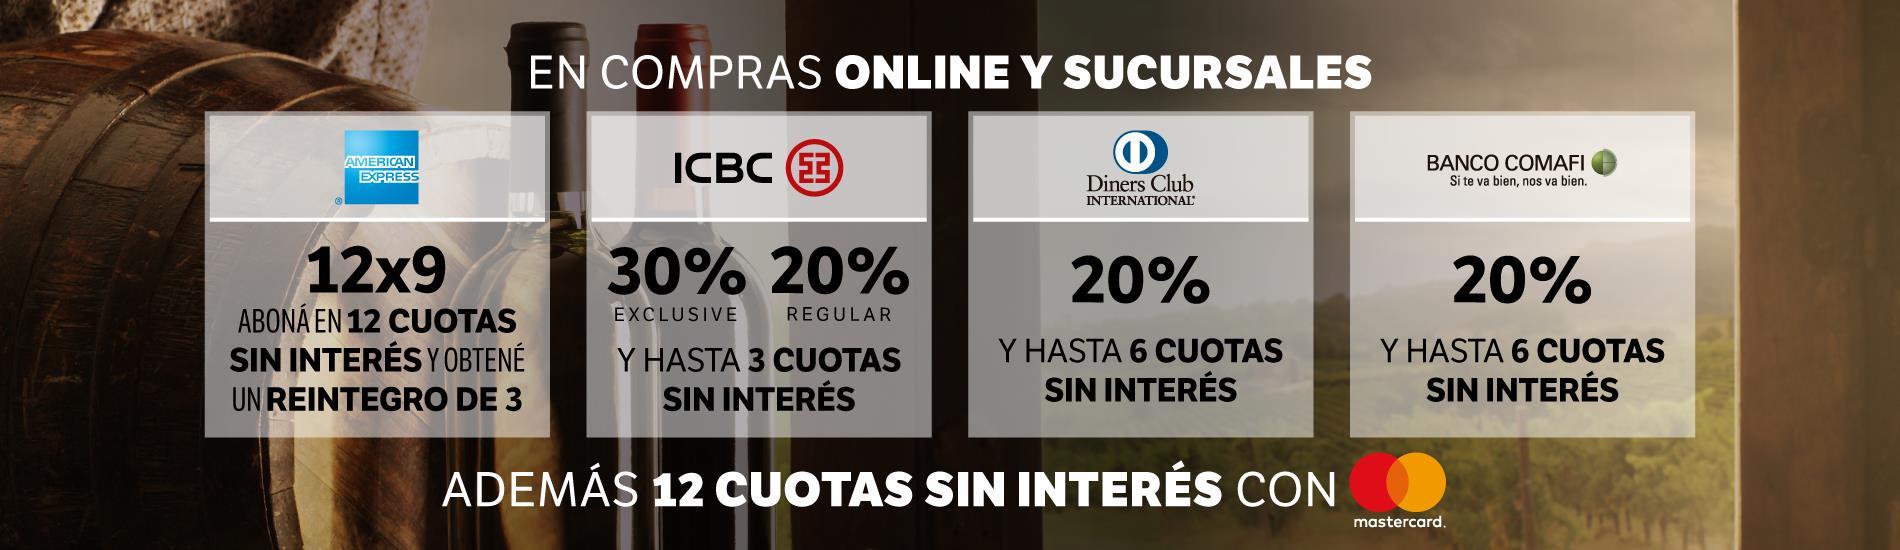 PC - bancos martes